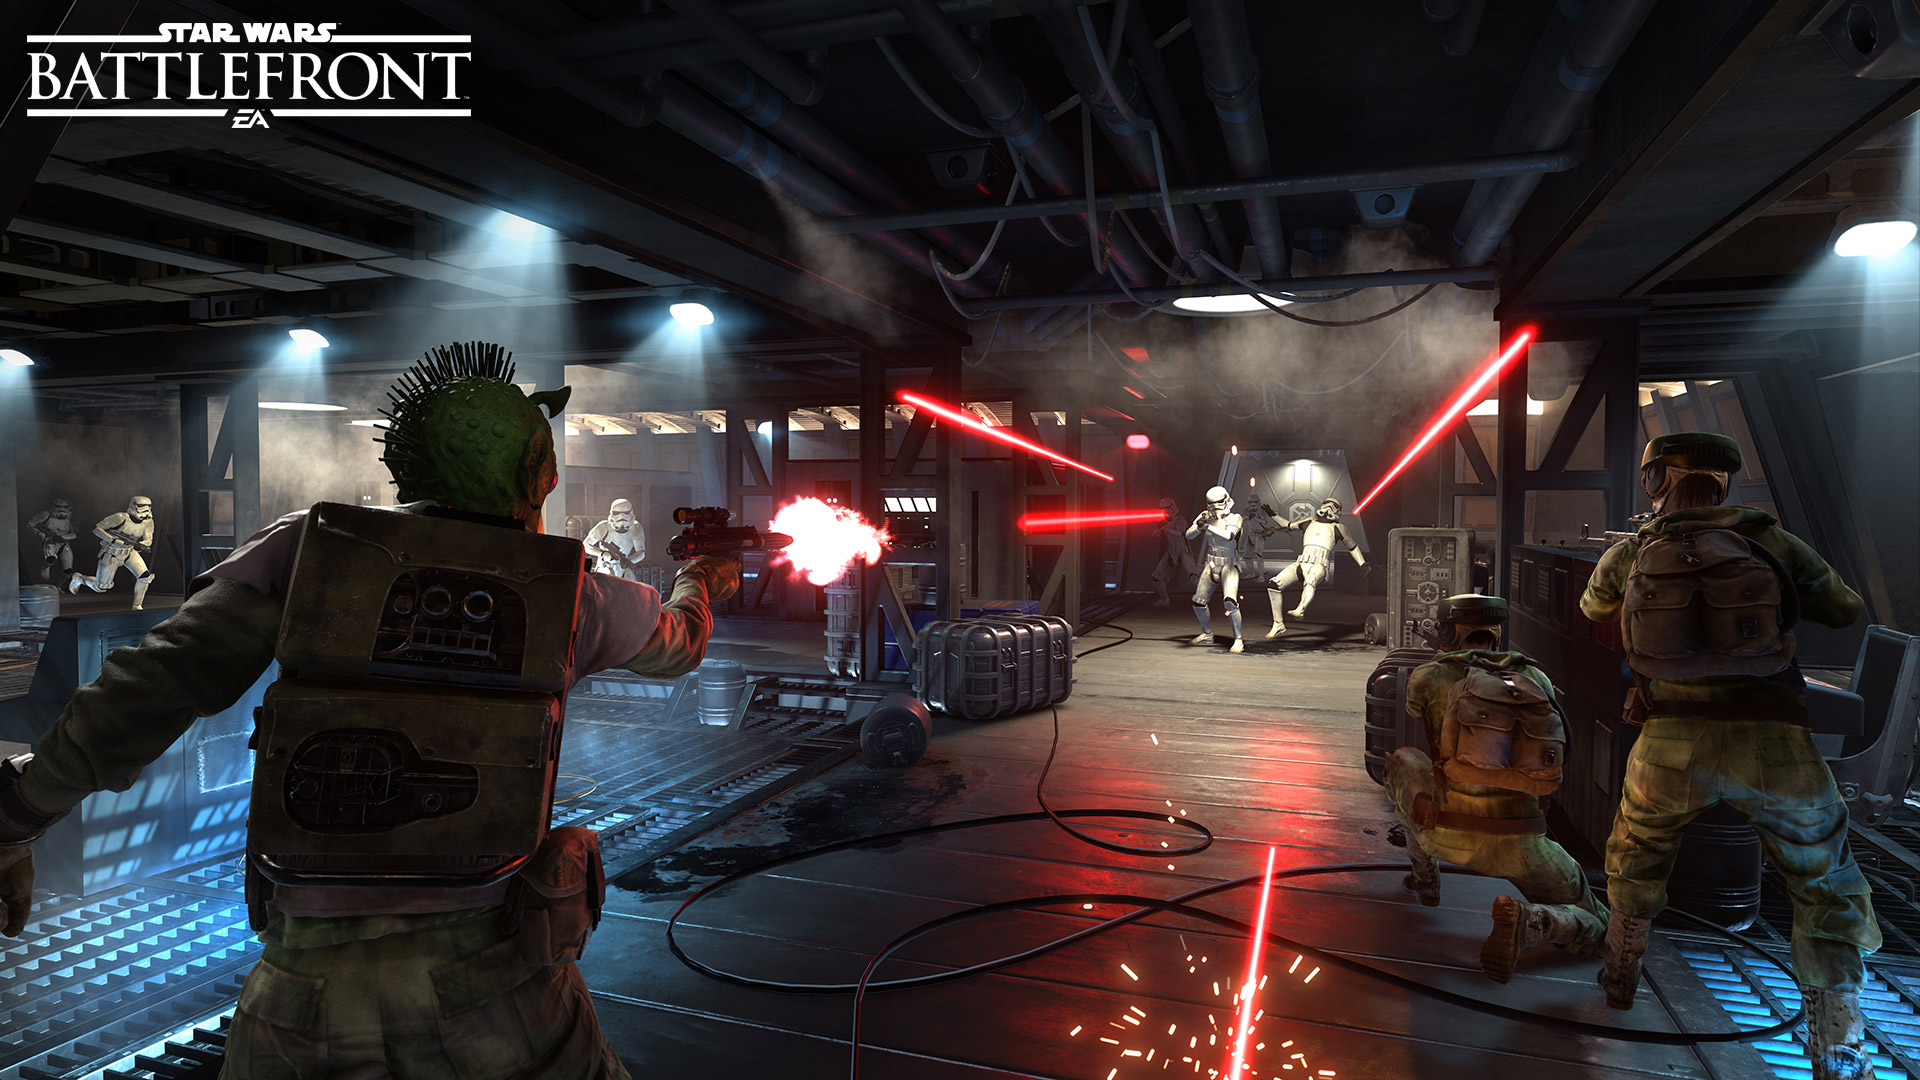 Starwars battlefront release date in Perth